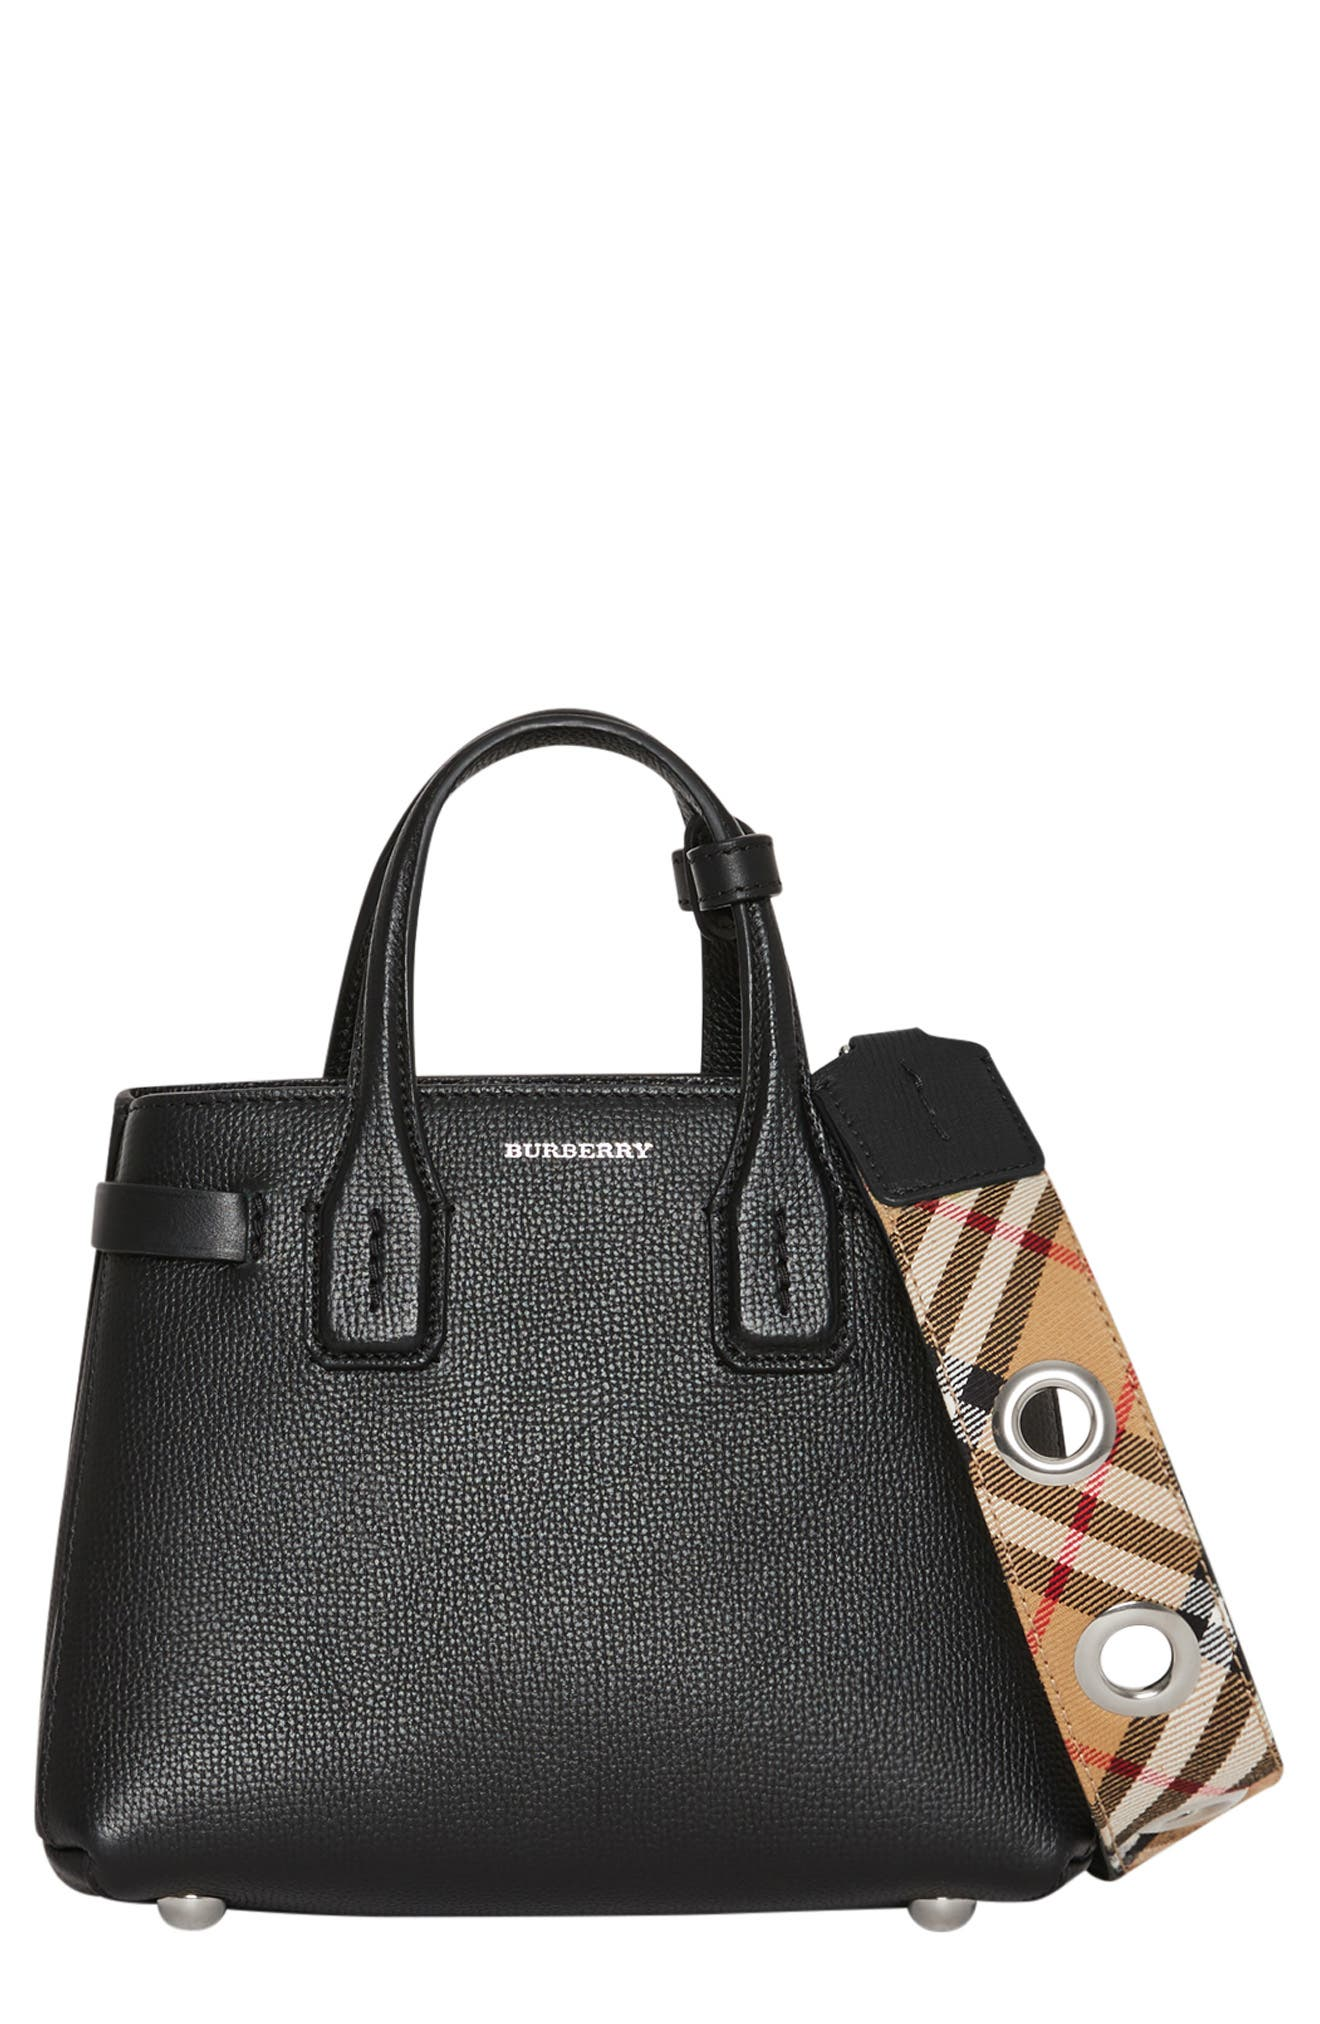 cc79ba548270 Burberry Crossbody Bags